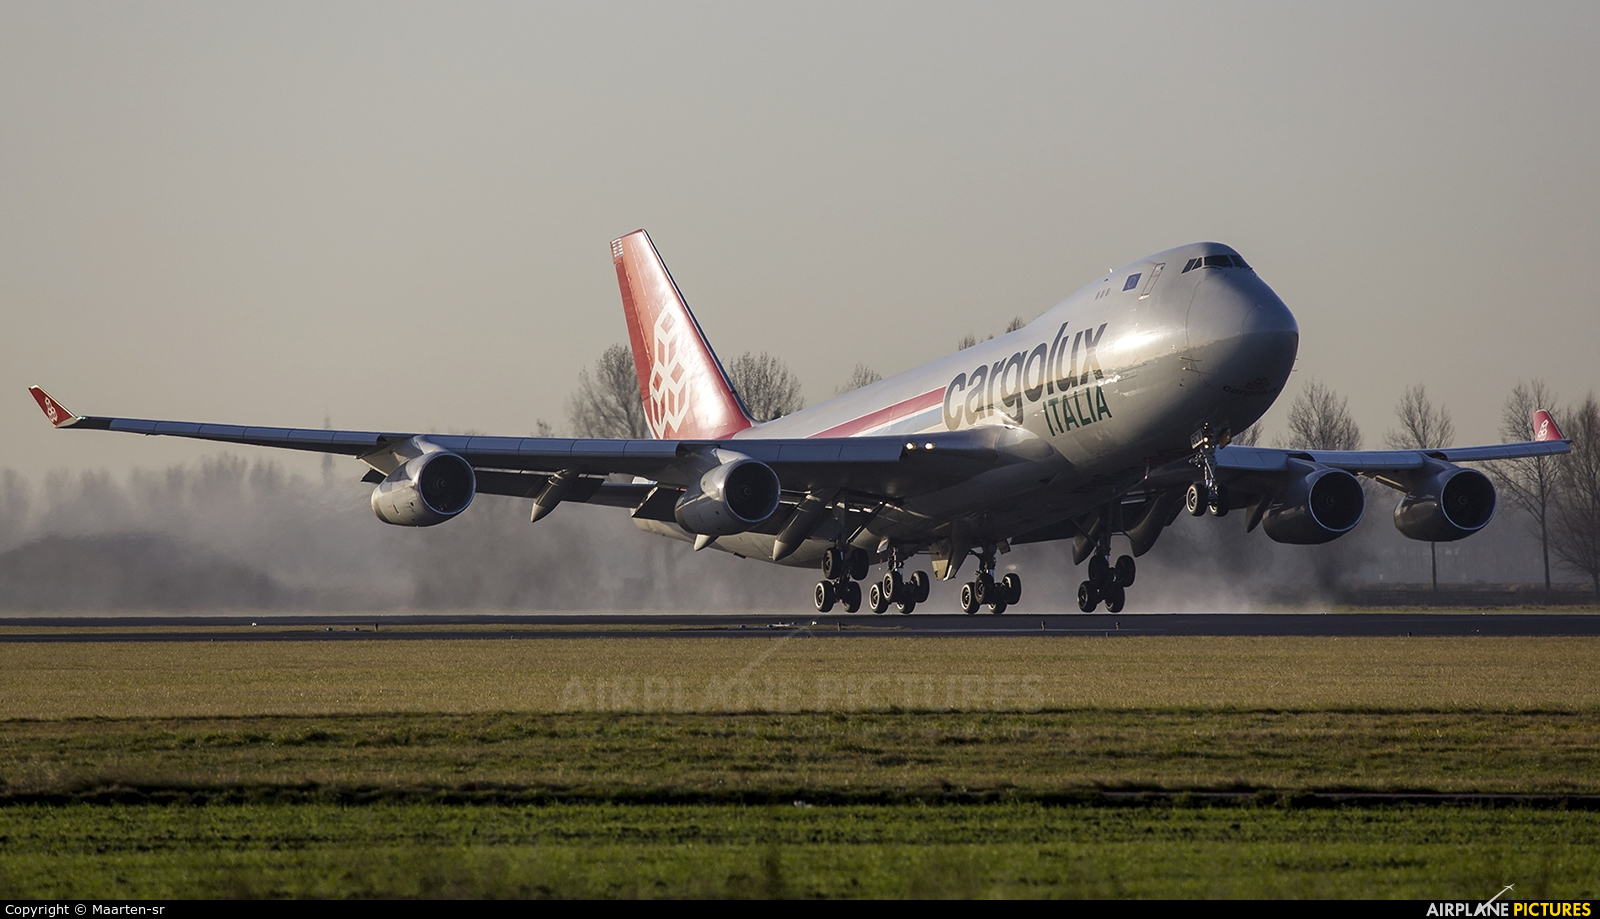 Cargolux LX-RCV aircraft at Amsterdam - Schiphol